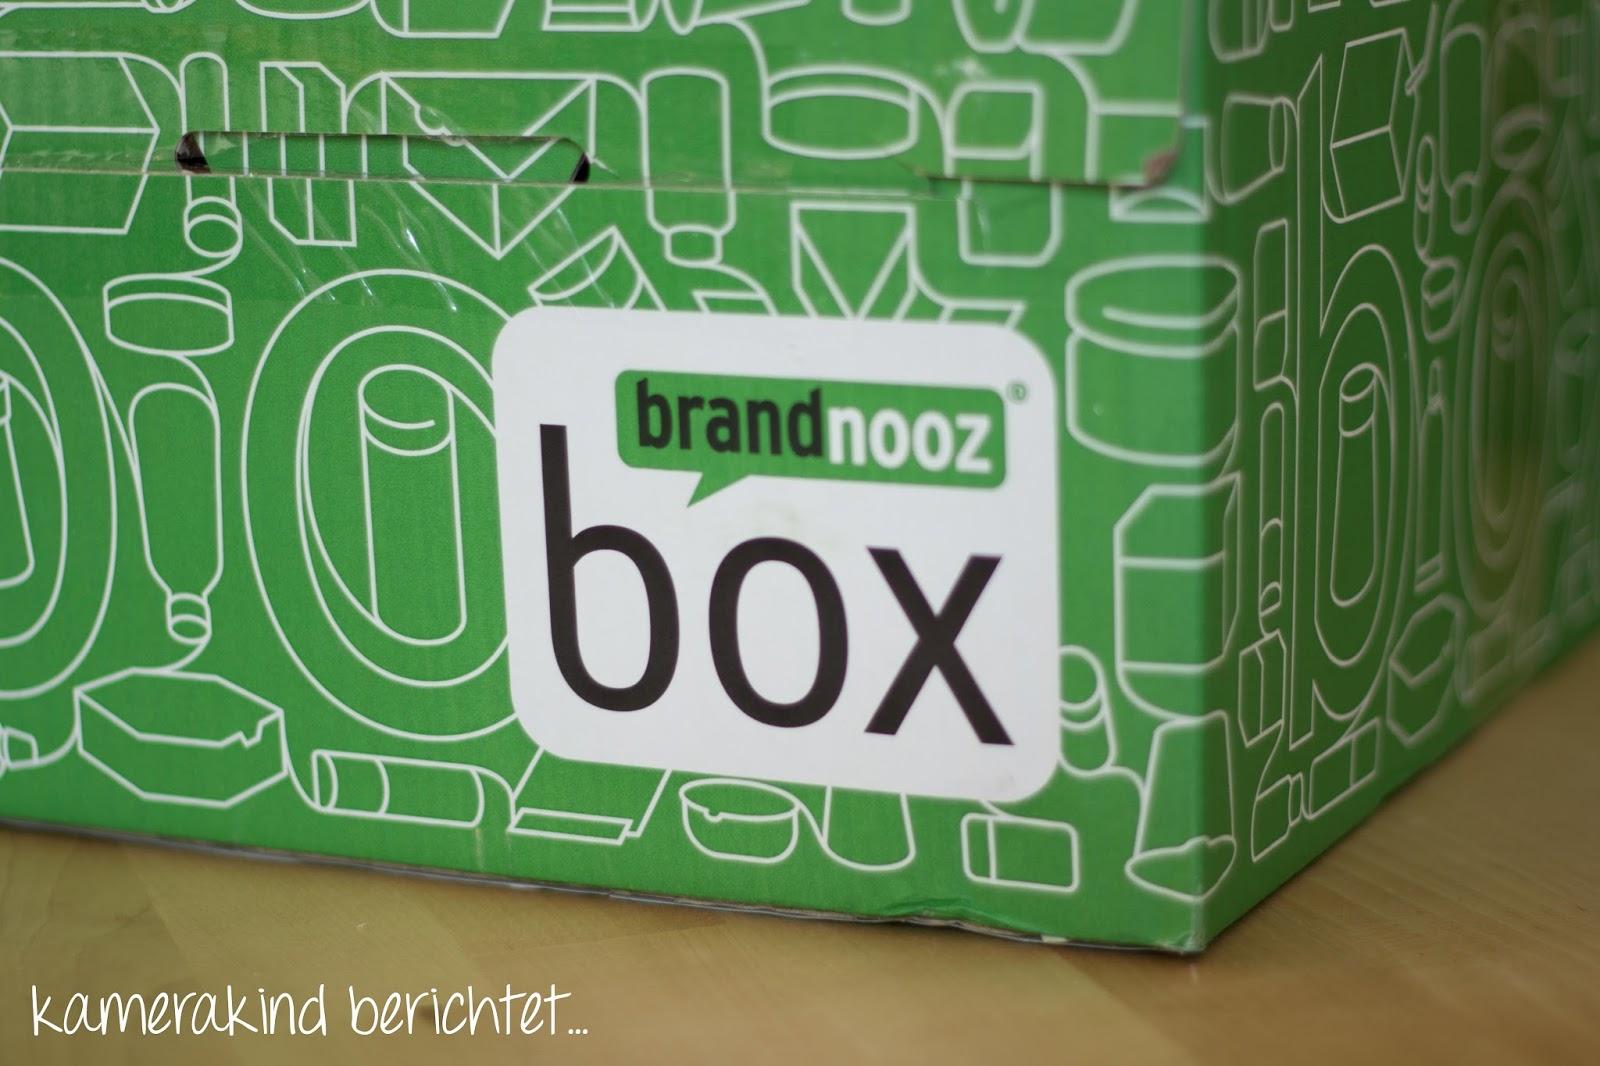 Beileger Brandnooz Box Januar